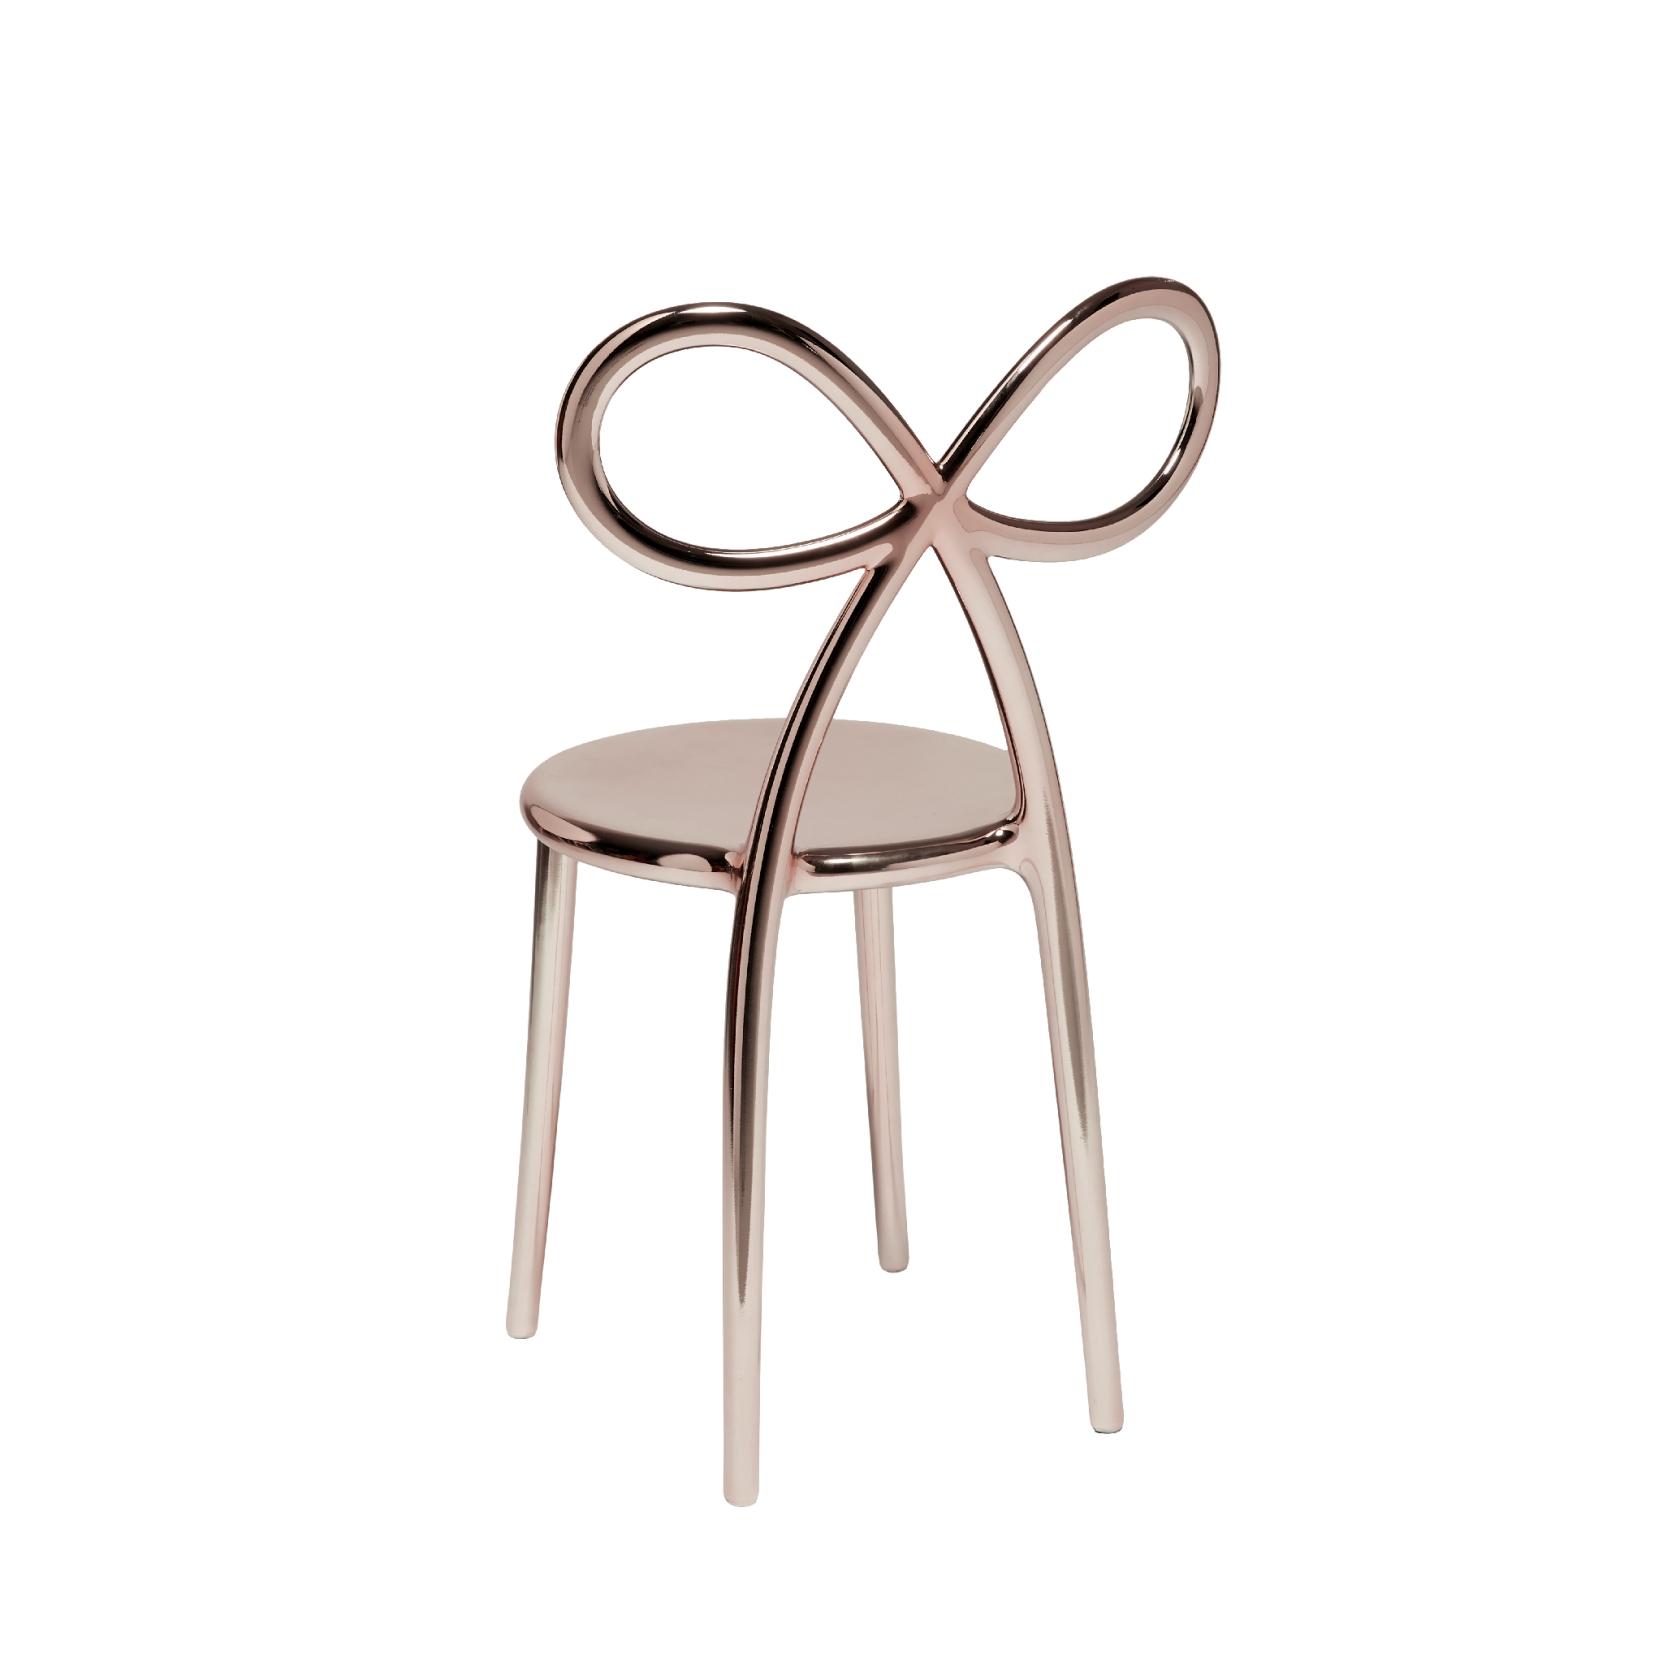 Pink Ribbon Metal Finish Chair Tattahome Gold Qeeboo nNwmPy8Ov0